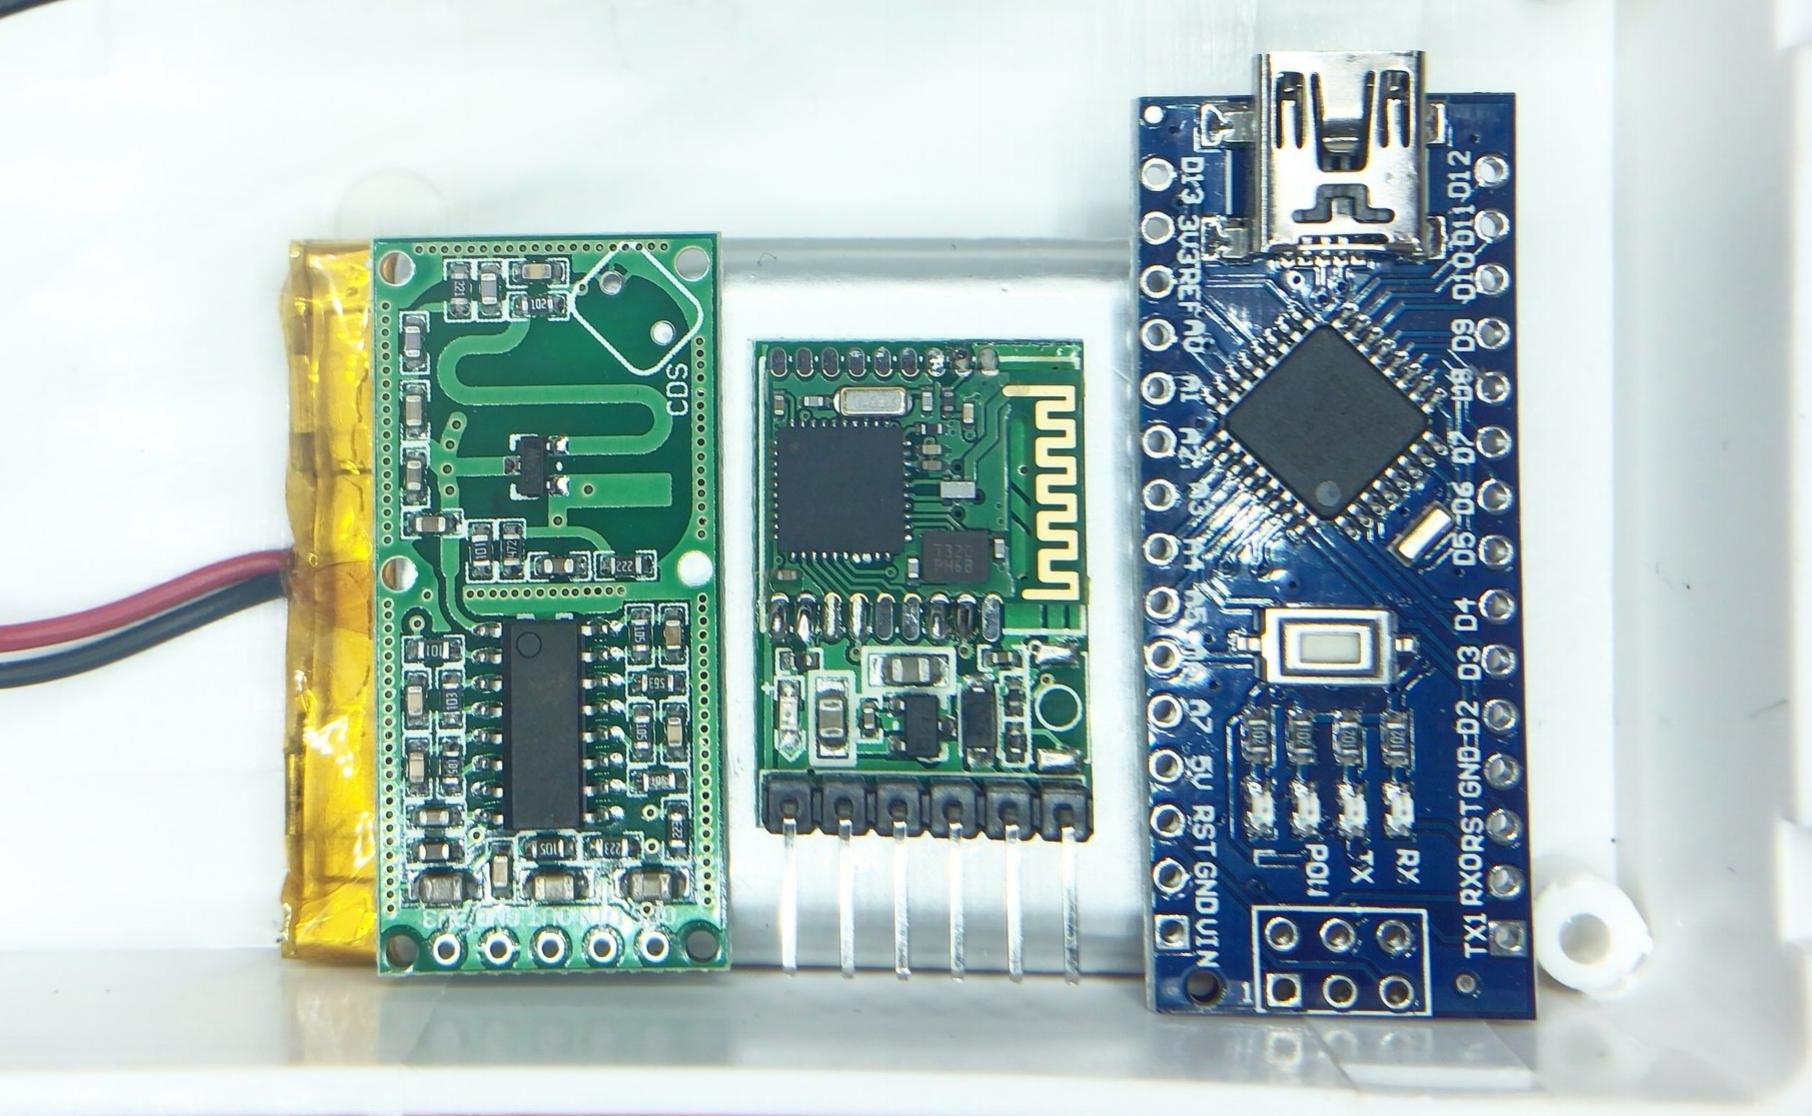 Arduino wall penetrating motion sensor using the rcwl